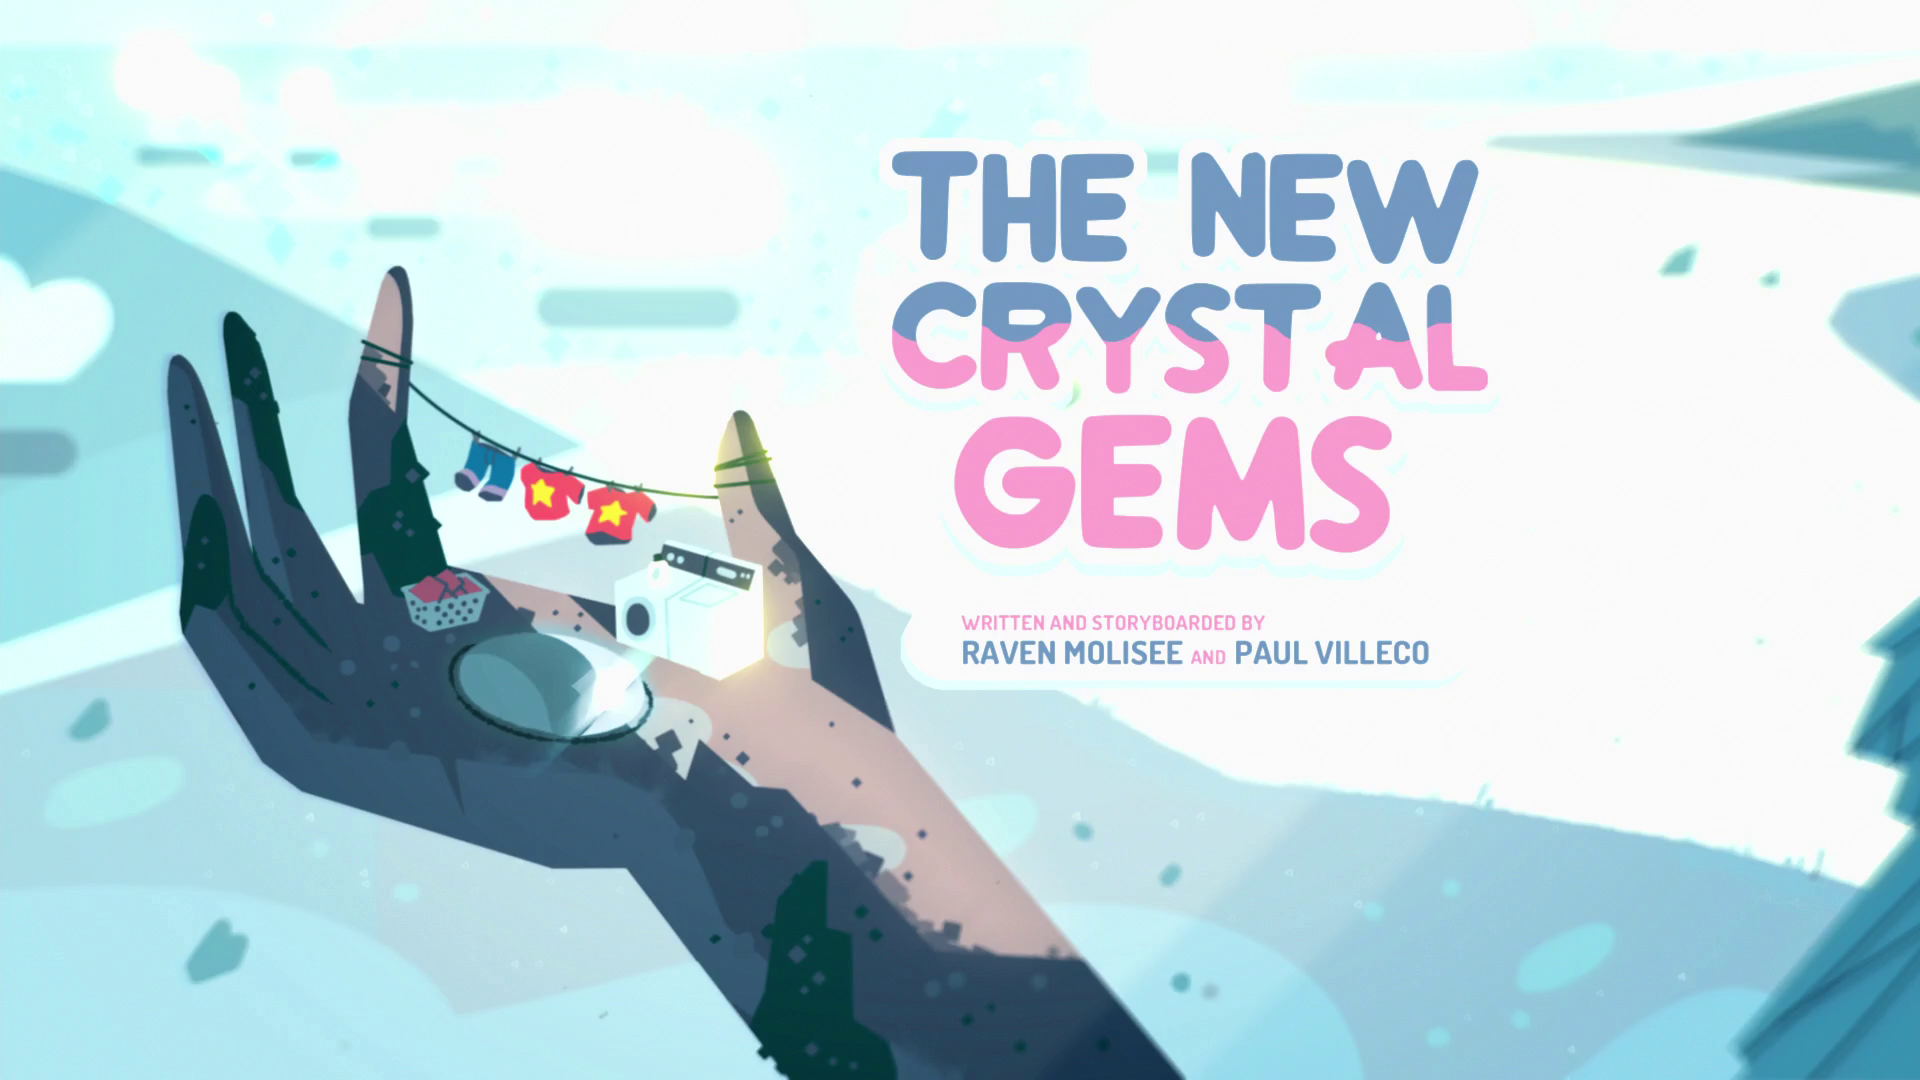 The New Crystal Gems